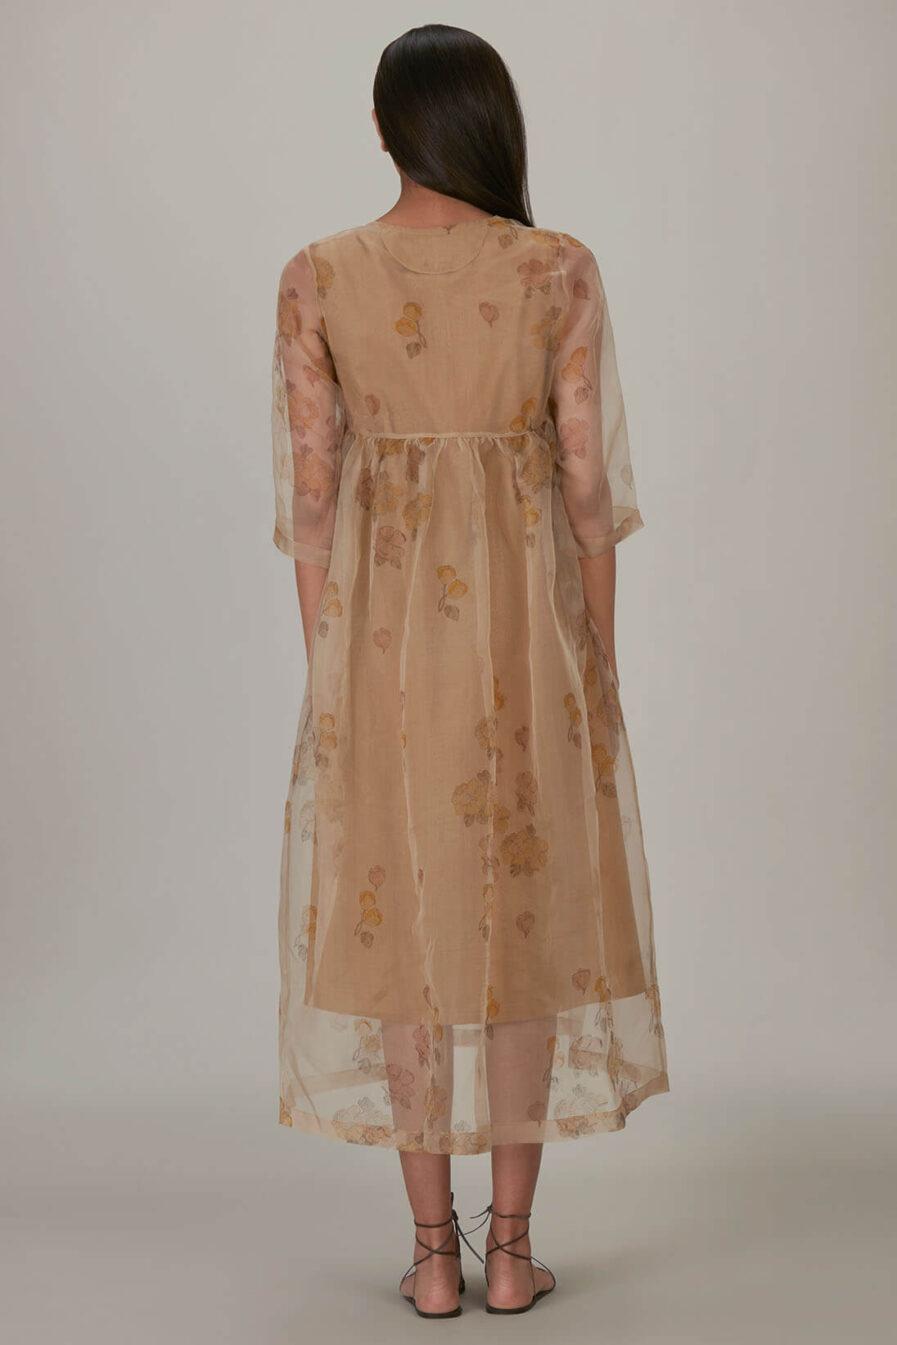 Anavila Yellow Block Printed Organza Summer Dress